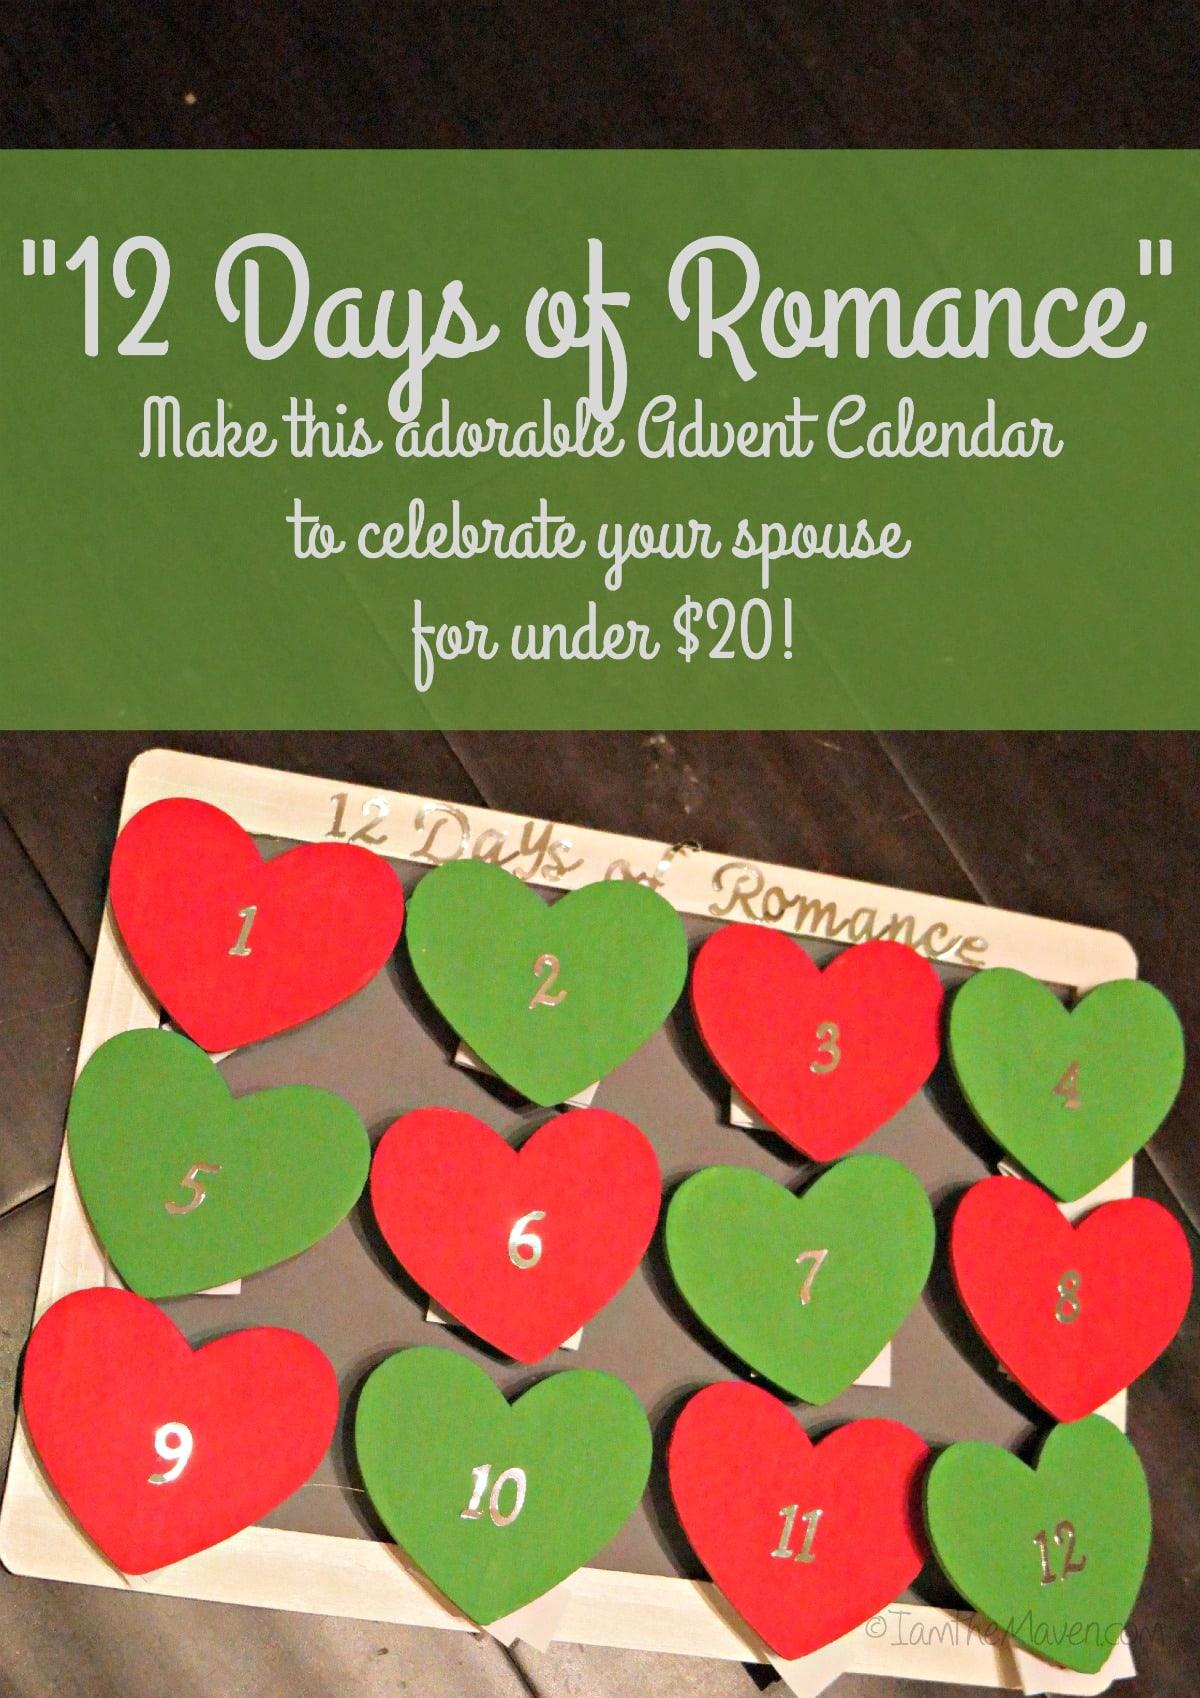 Romantic Calendar Ideas : Days of romantic date ideas i am the maven